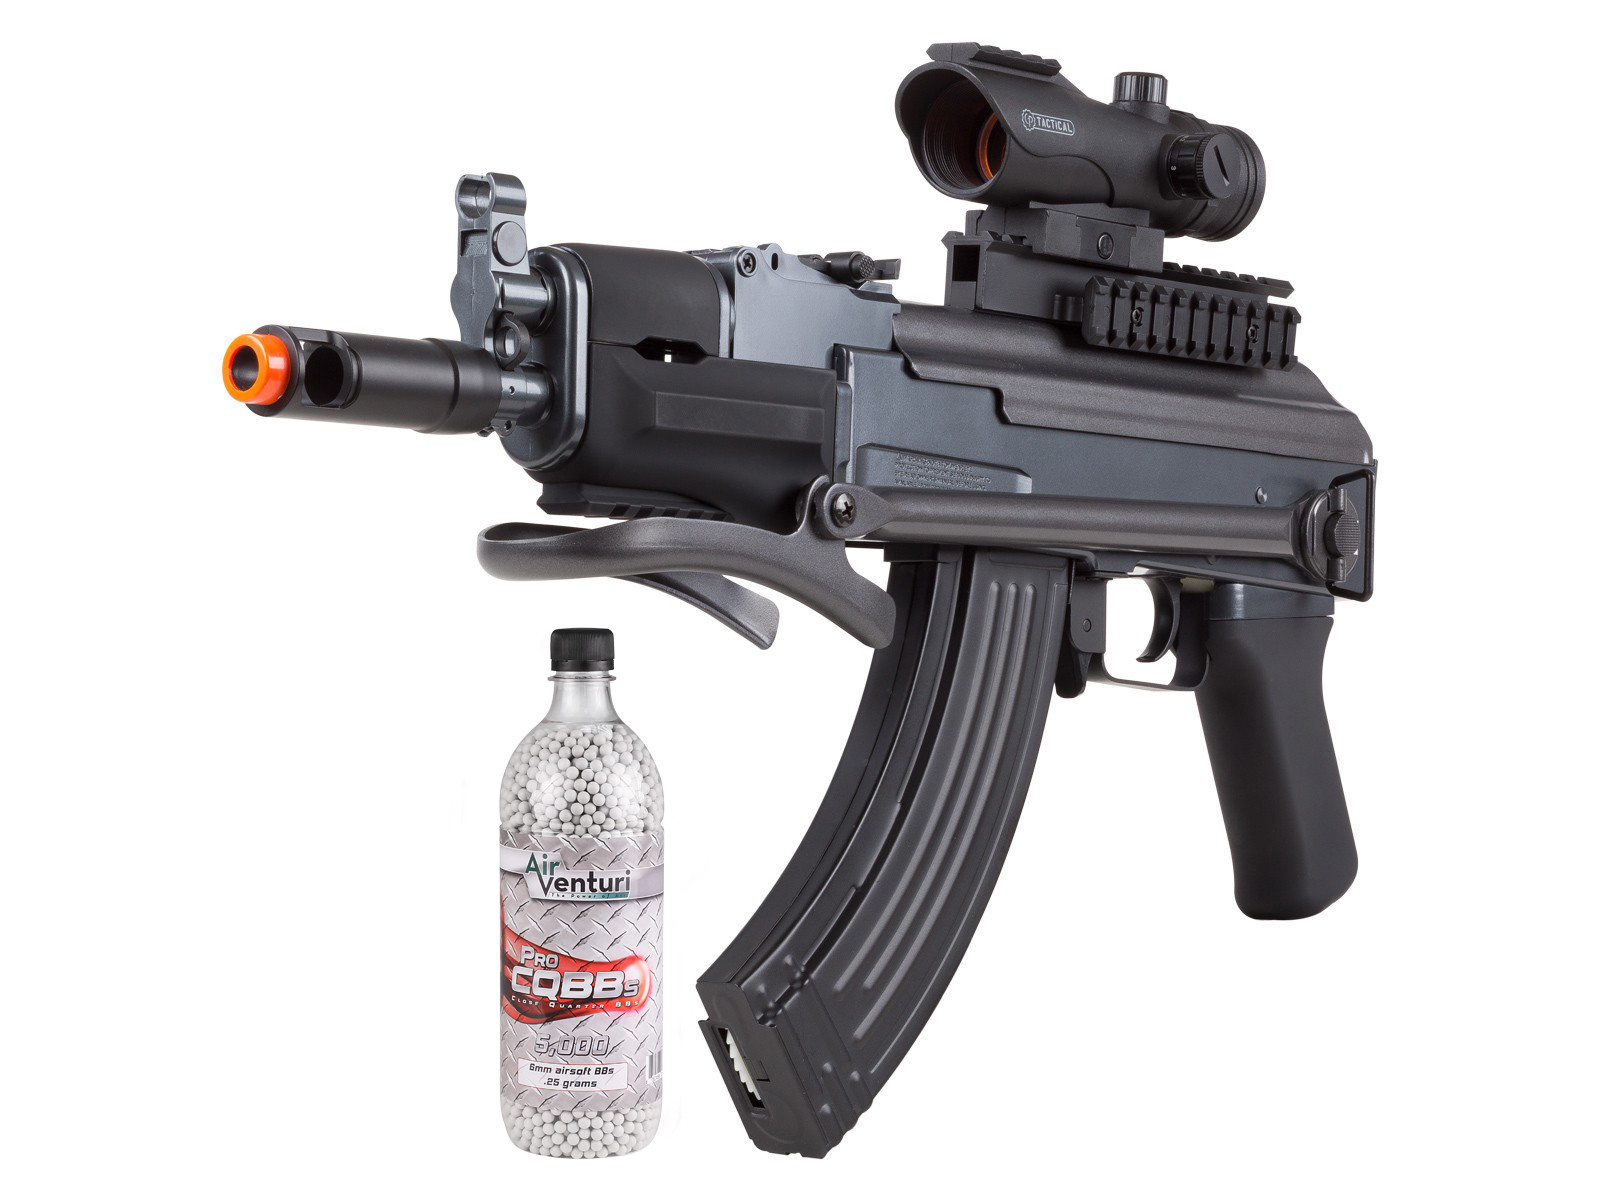 Game Face GF76 AEG Airsoft Rifle Kit, Black